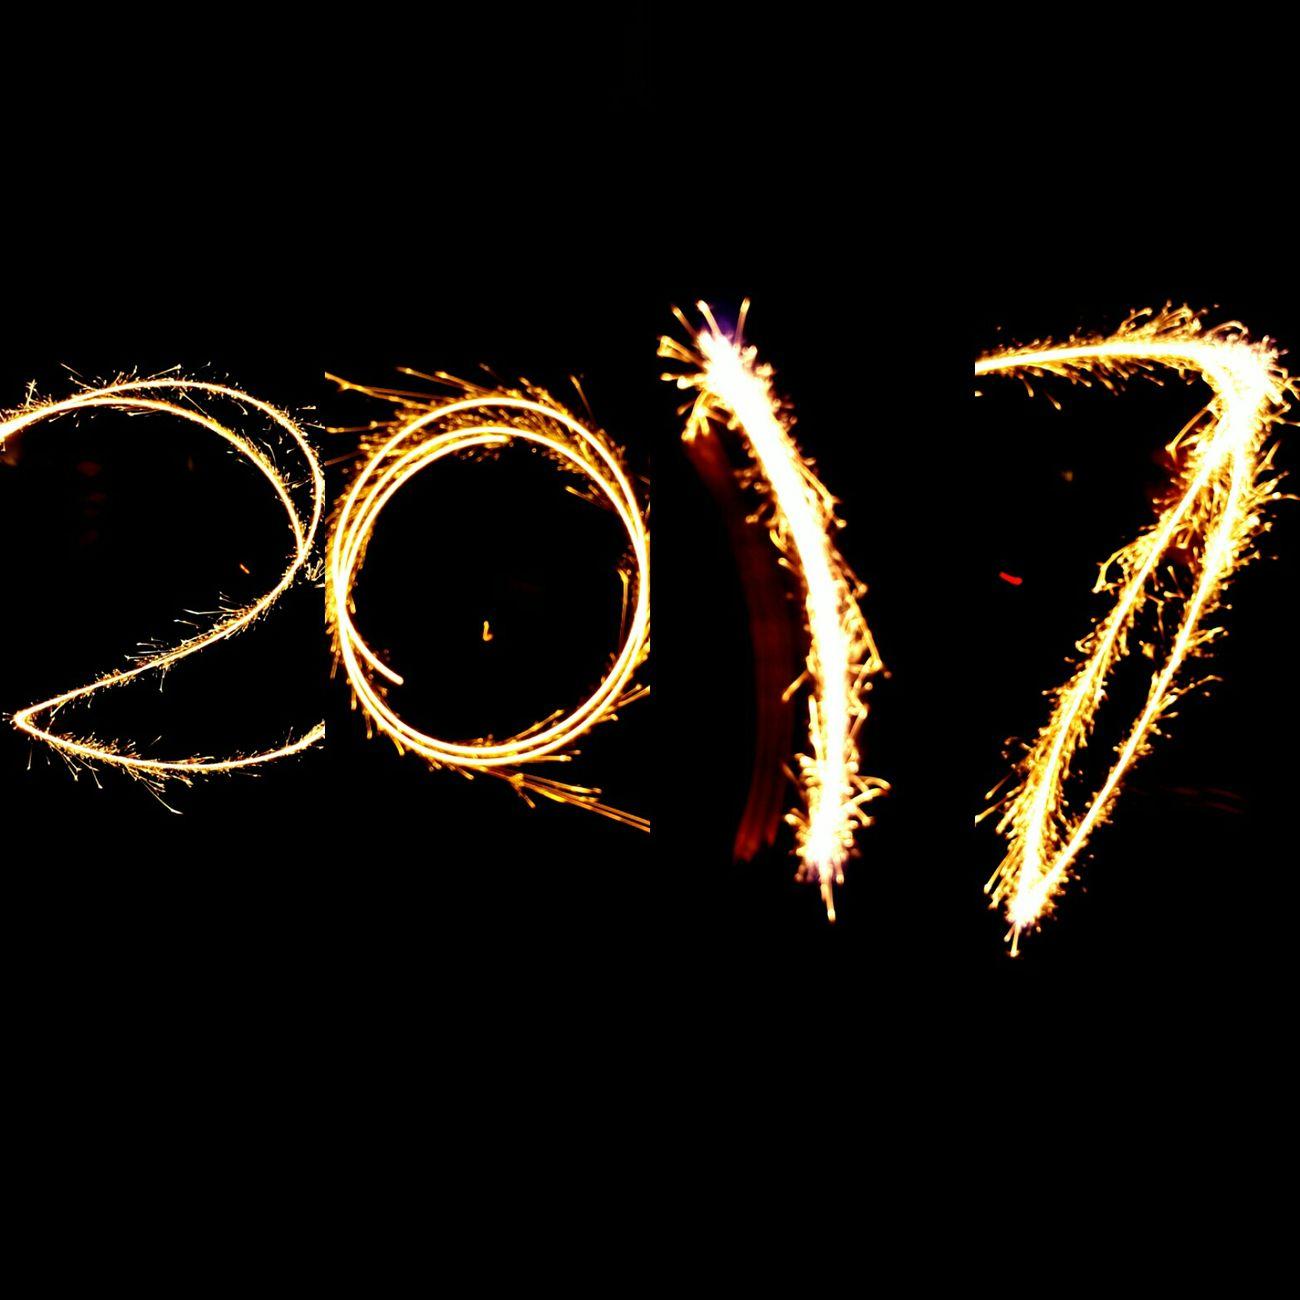 Sluitertijd NYE Celebration Firework Display Sparks Night 2017